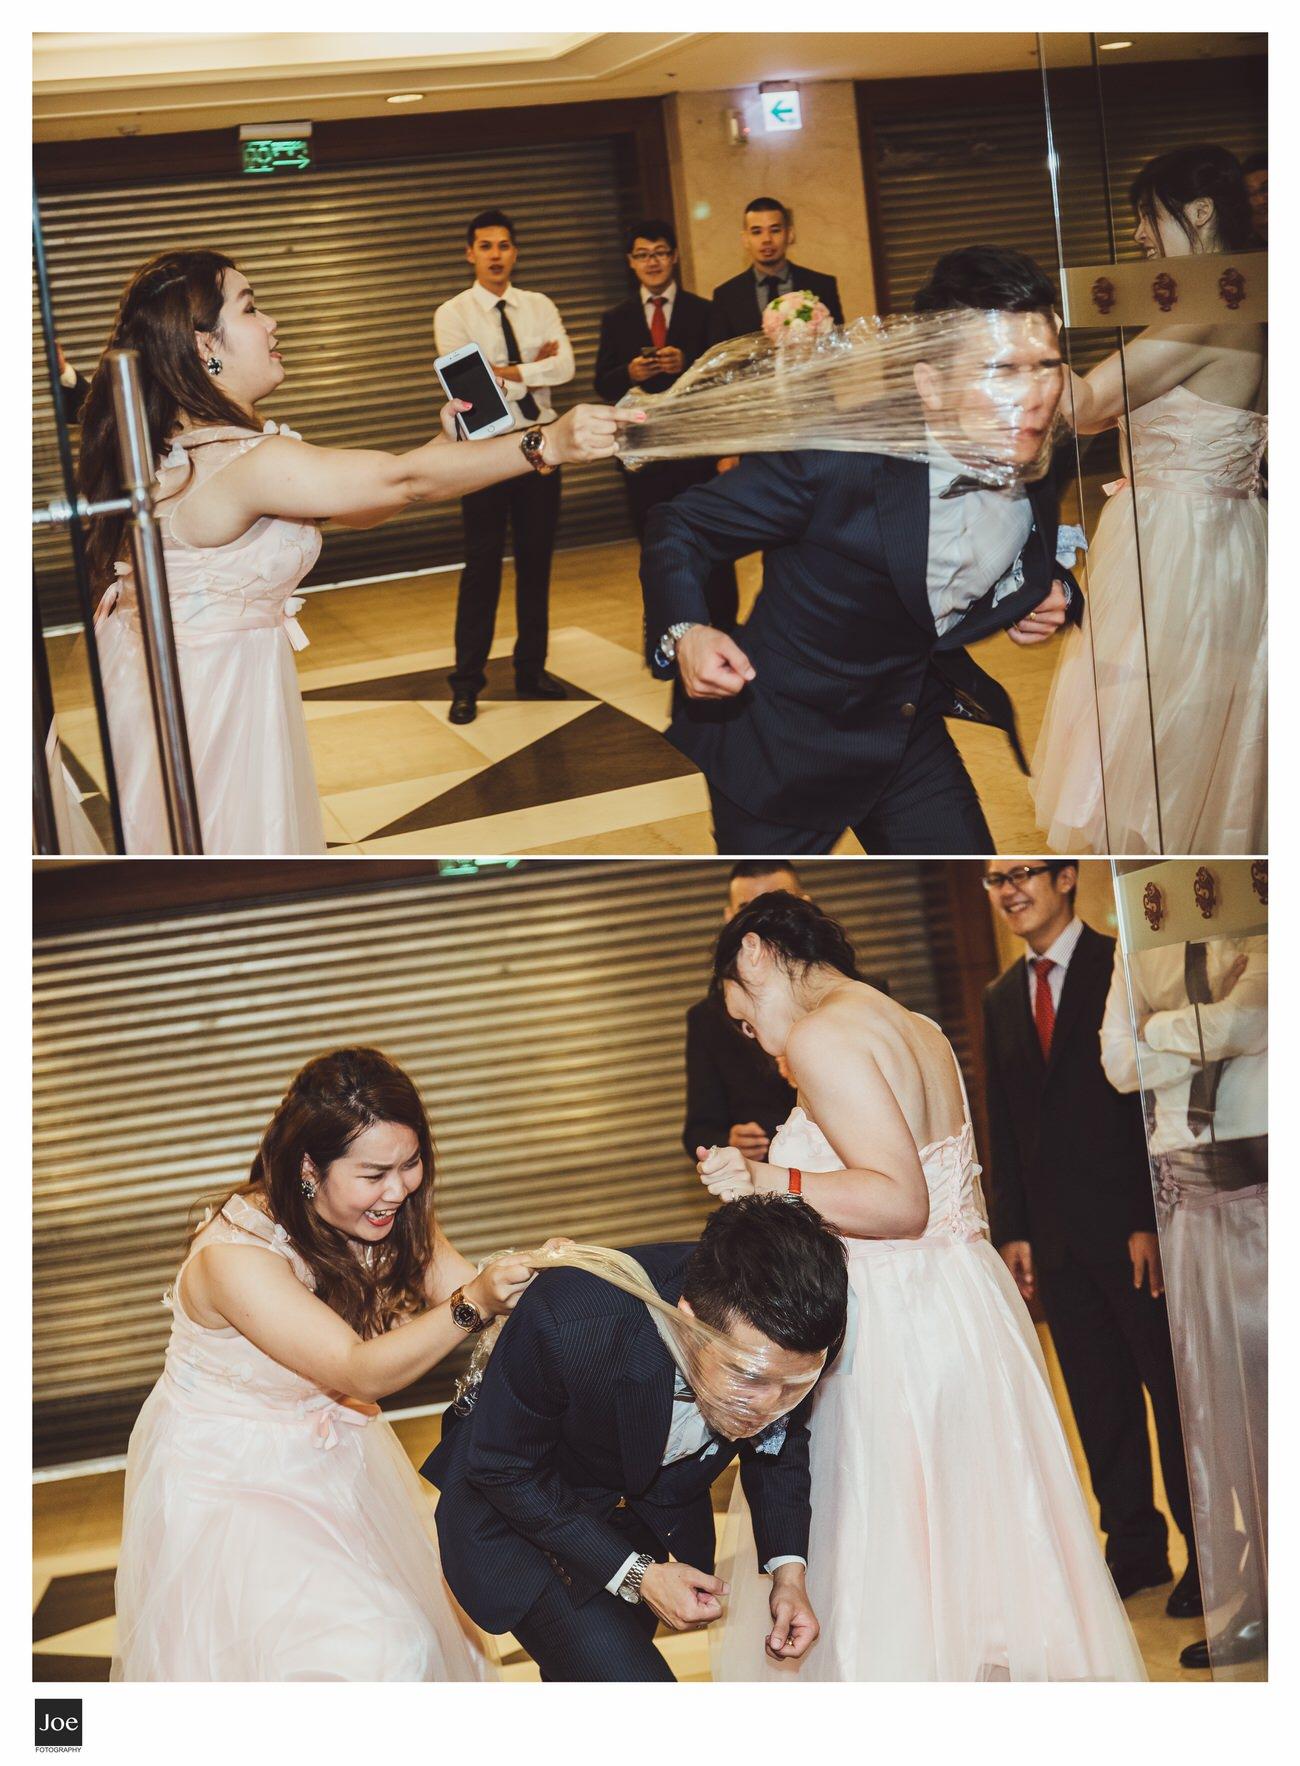 sunworld-dynasty-hotel-taipei-wedding-photo-joe-fotography-angel-jay-034.jpg